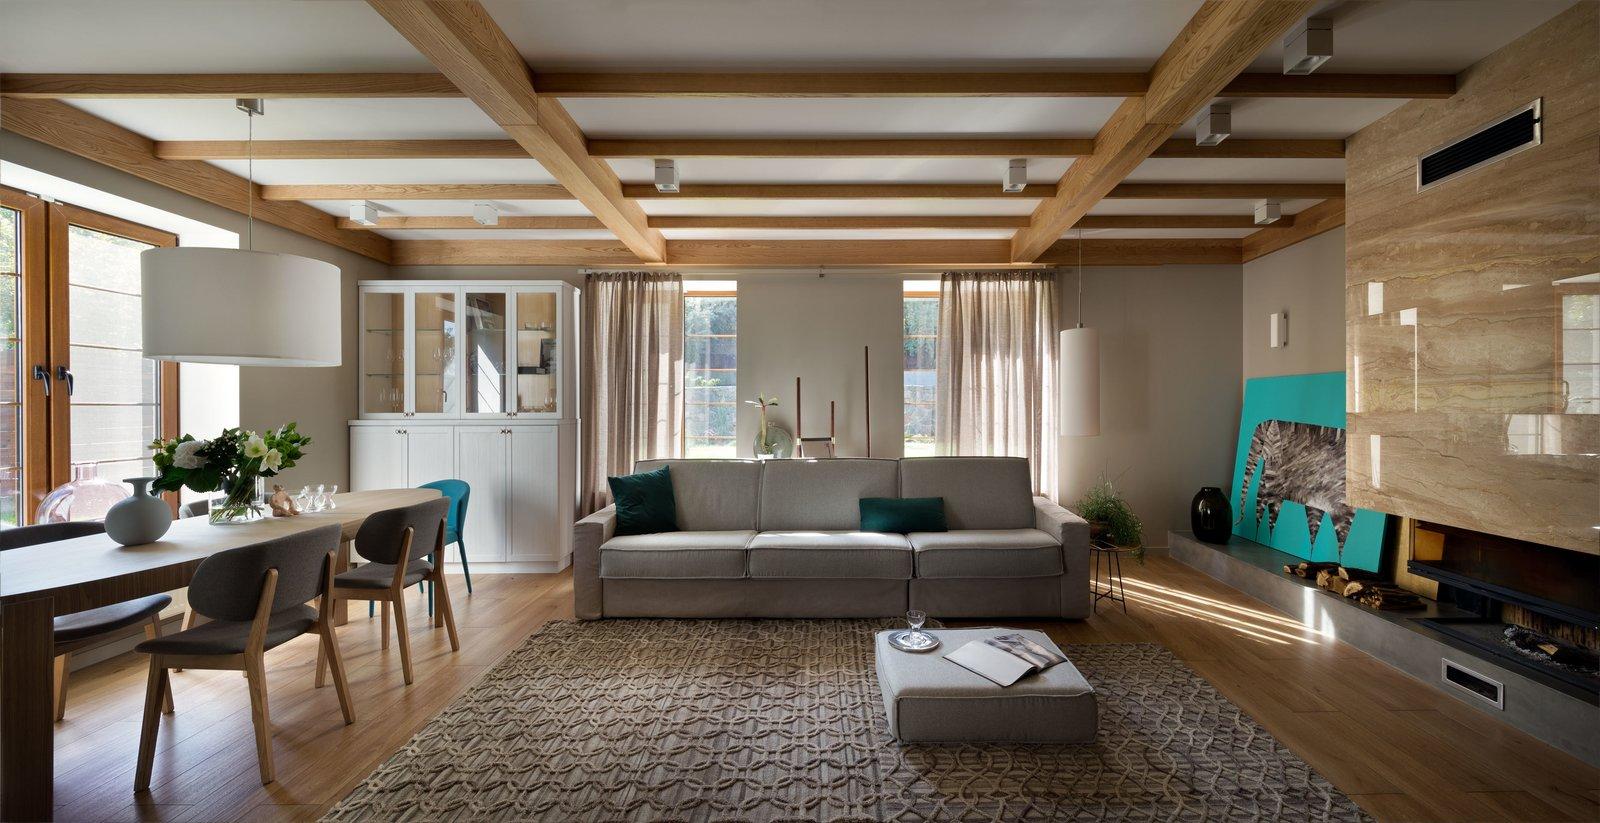 Living Room, Sofa, Coffee Tables, Wall Lighting, Pendant Lighting, and Medium Hardwood Floor  House Lightray